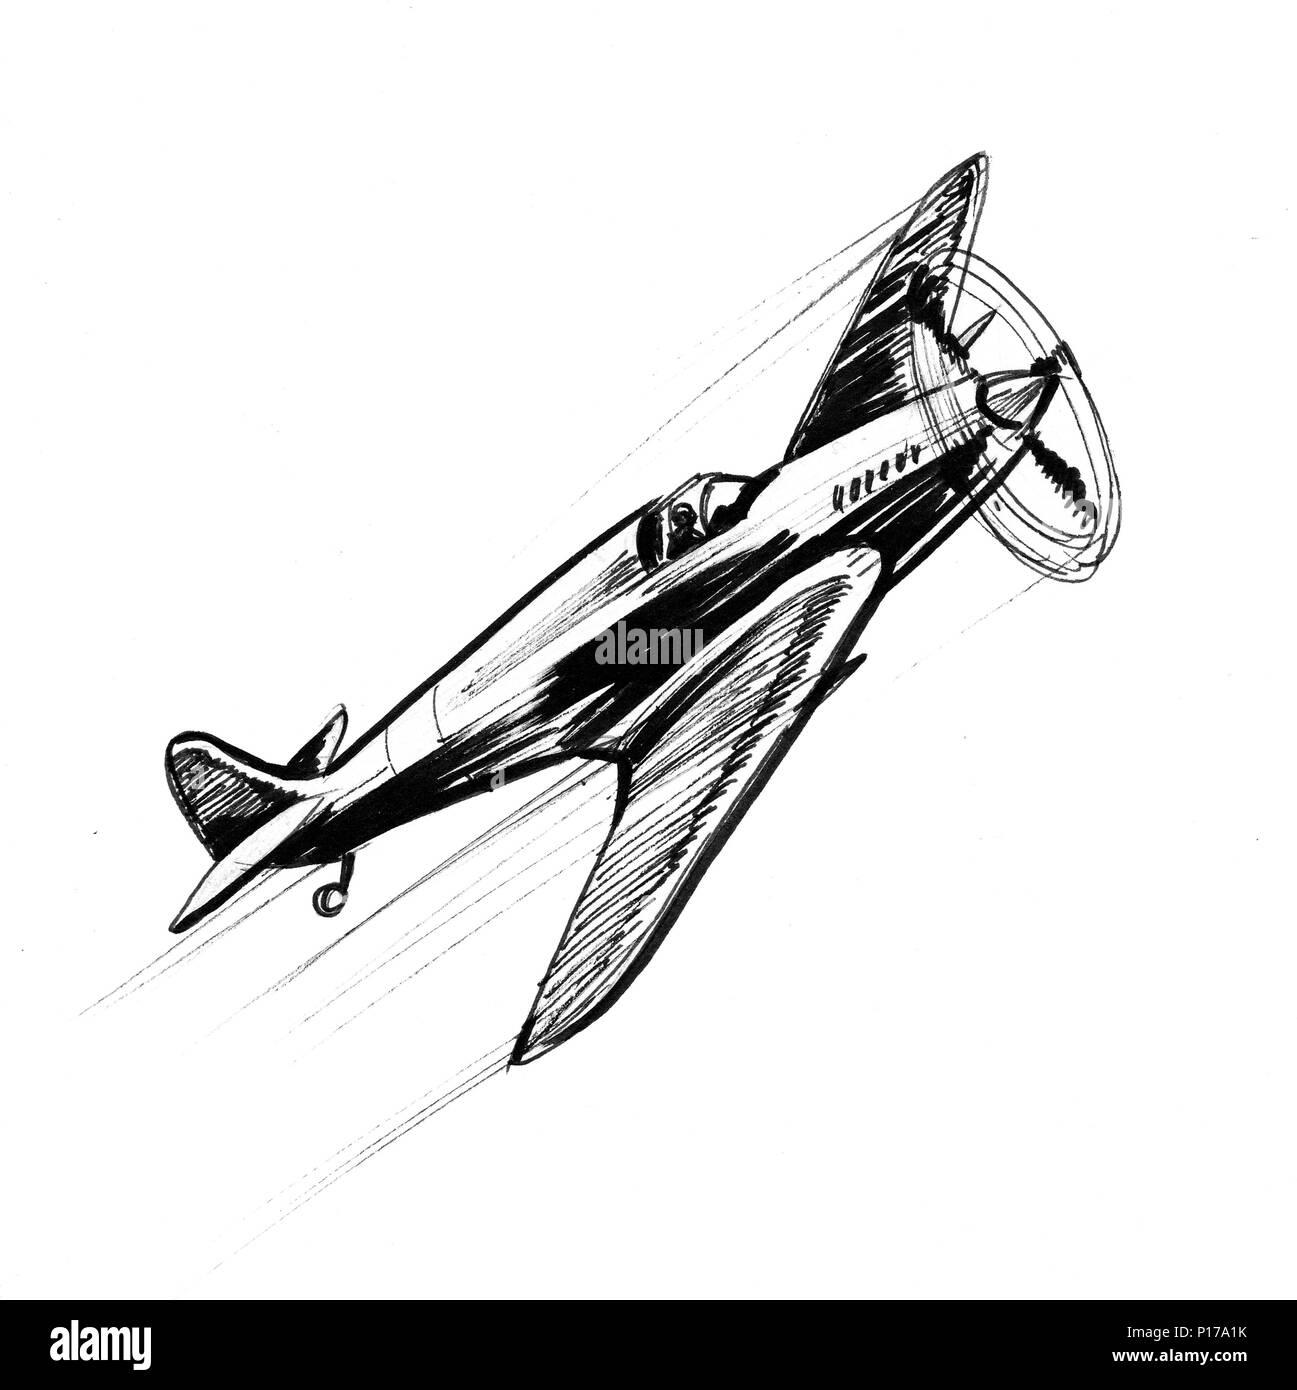 World War 2 Military Plane Ink Black And White Illustration Stock